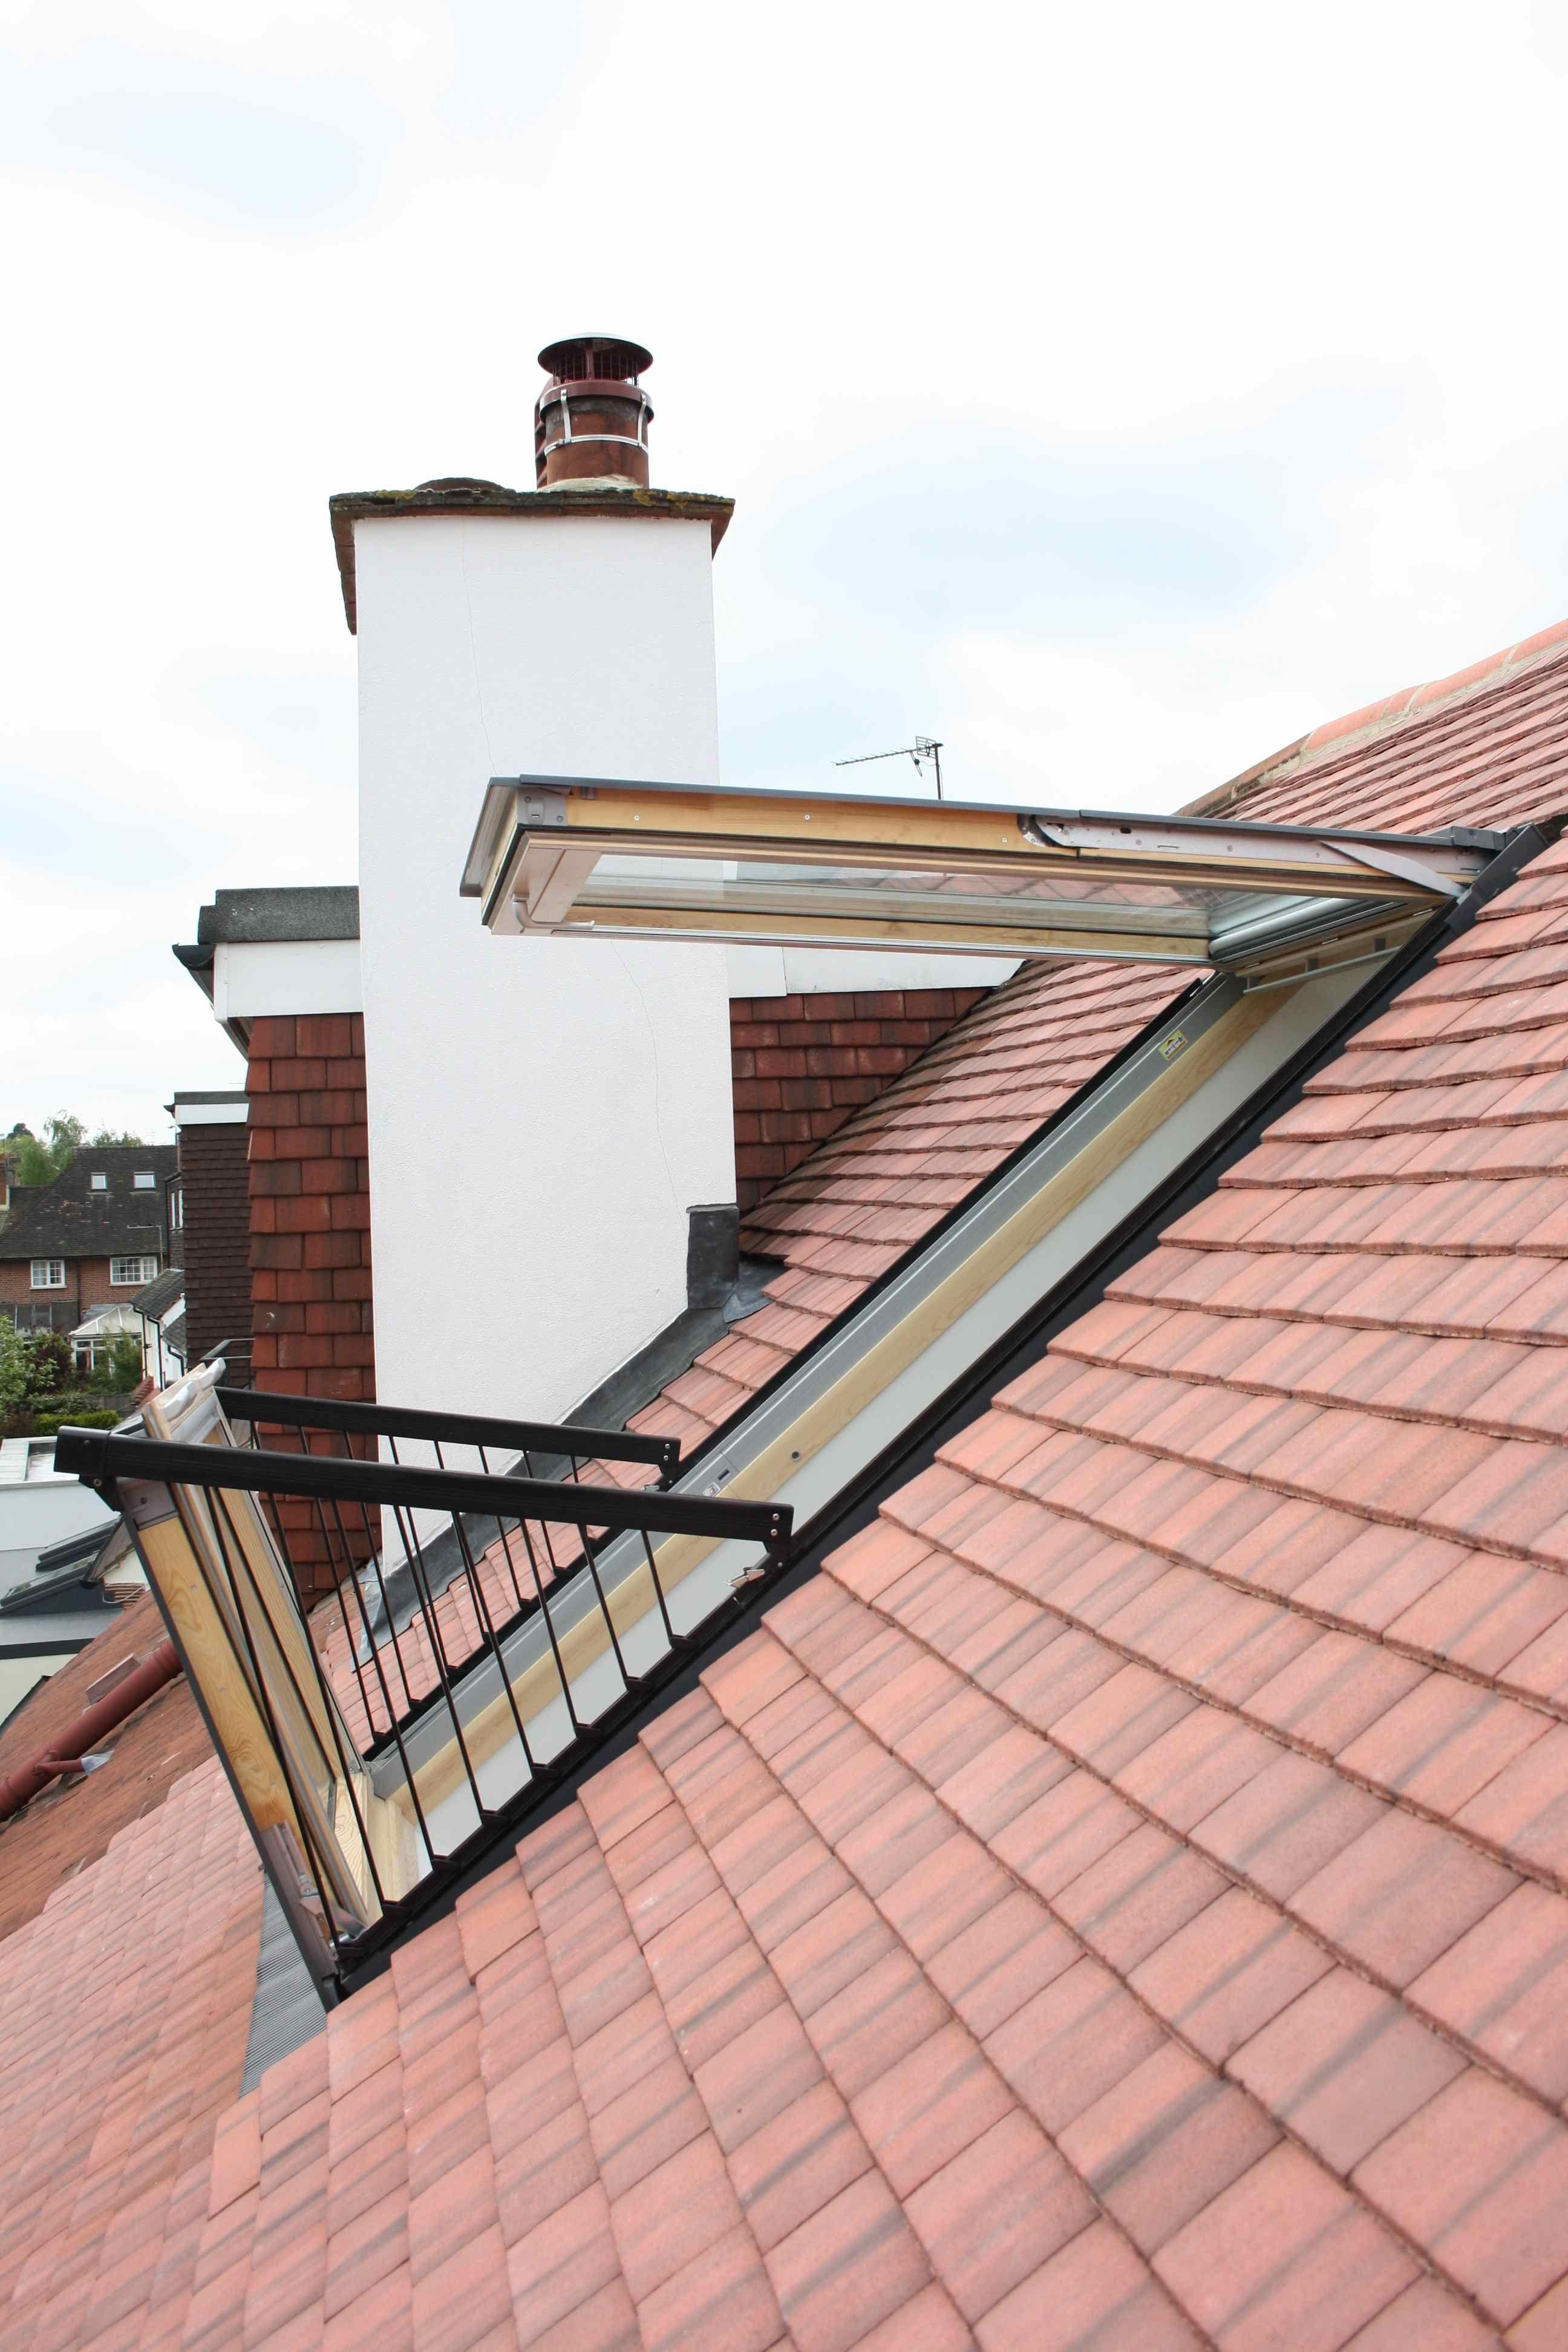 Skylight Loft Conversion London With Velux Balcony Window Loft Conversion Balcony Loft Conversion Velux Loft Conversion